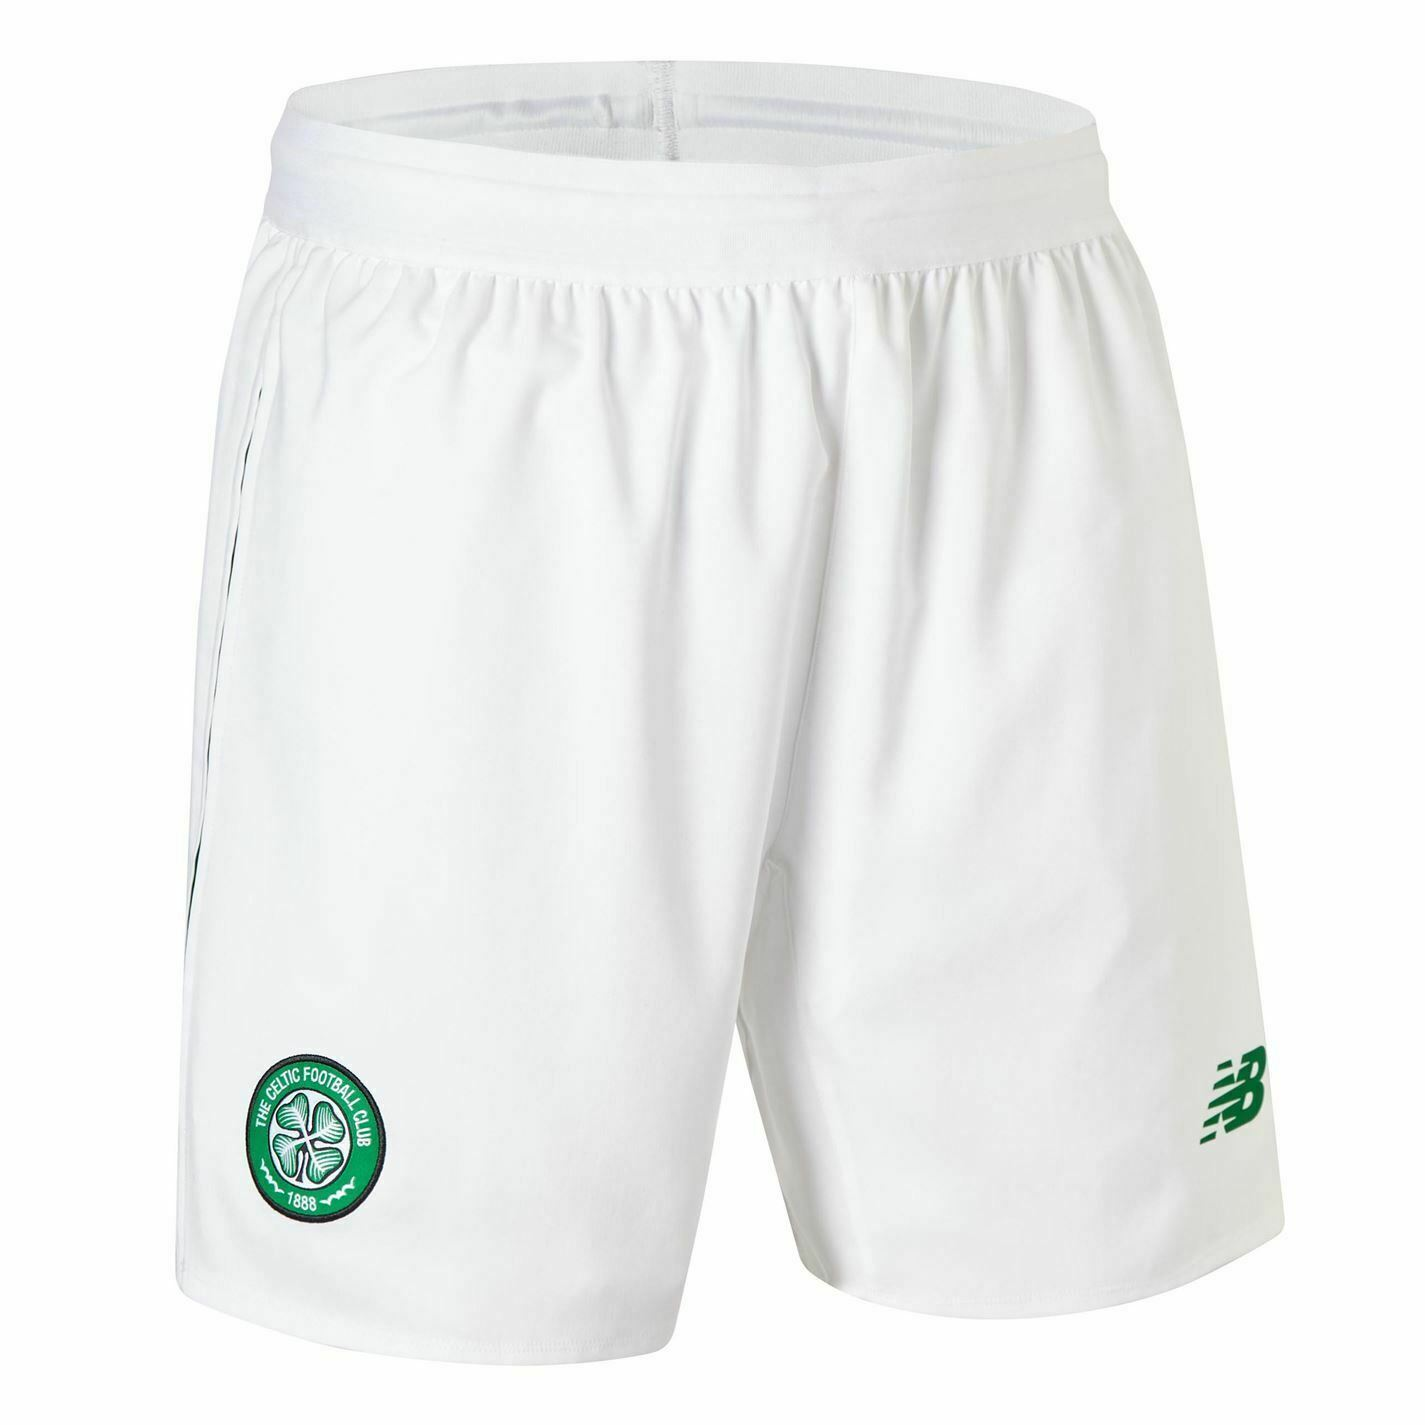 New Balance Celta Casa Pantalones Cortos 2018 2019 Hombres blancoo Fútbol Ropa